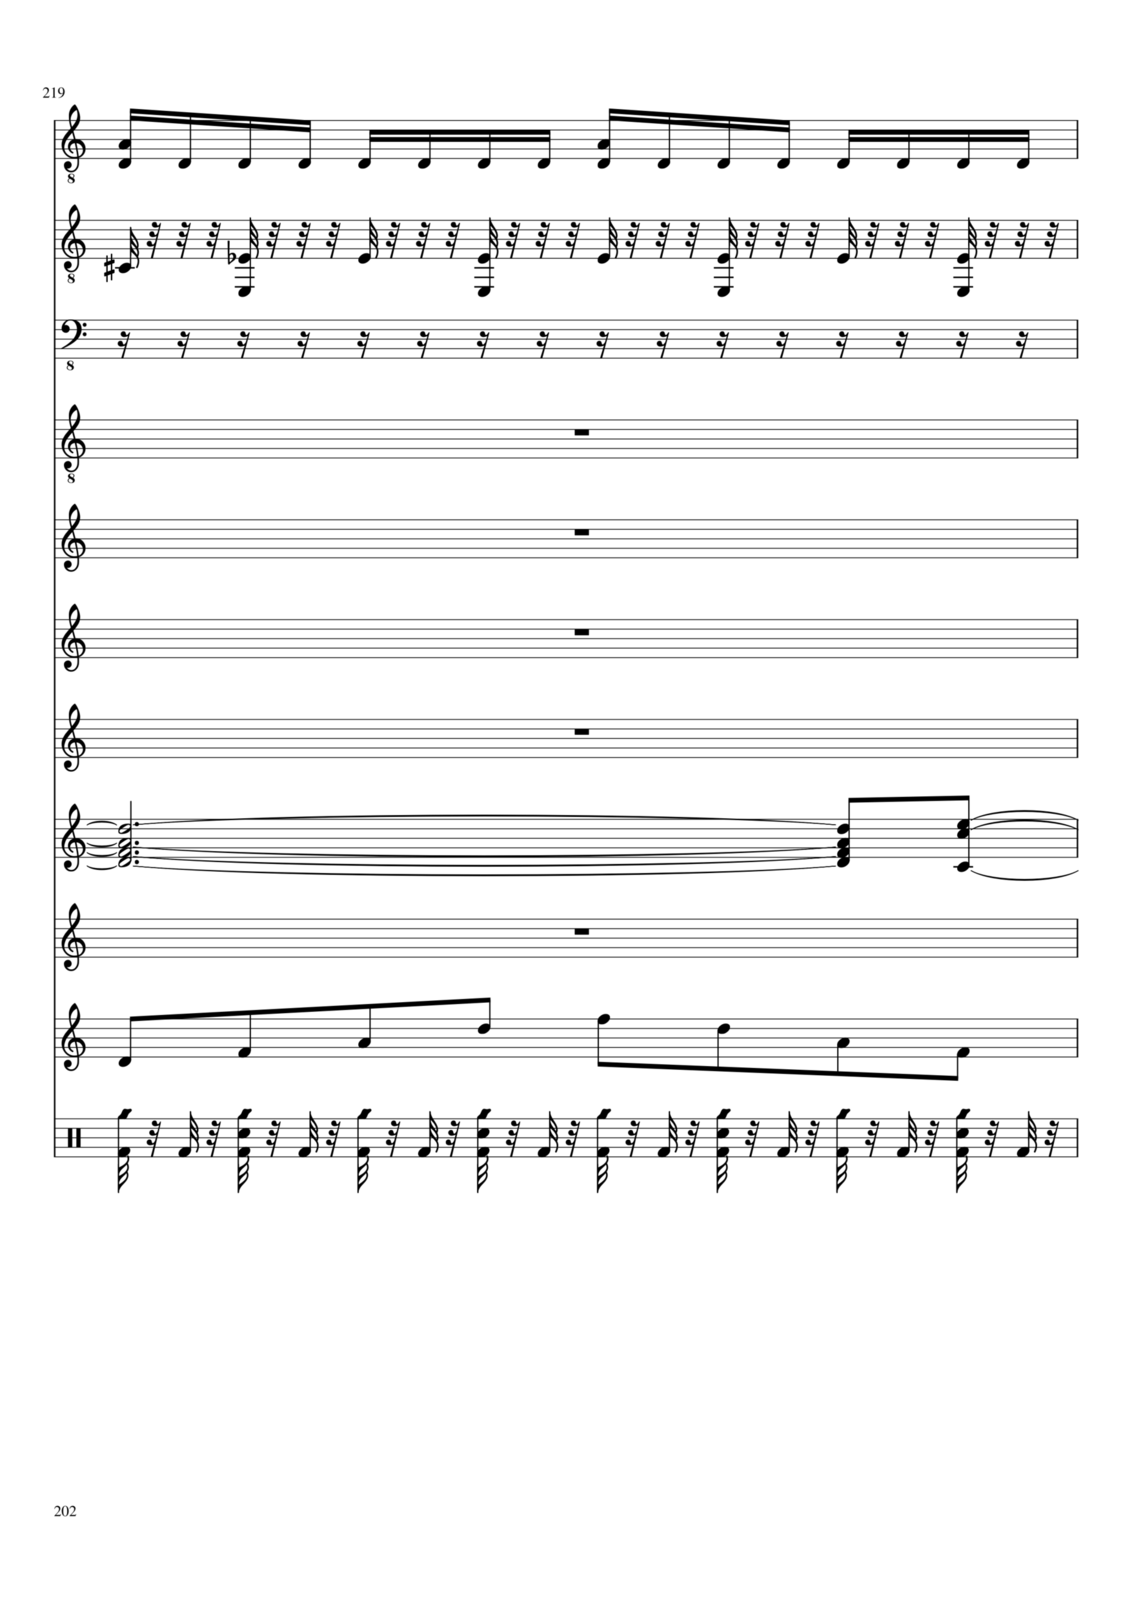 Belyiy sokol slide, Image 202